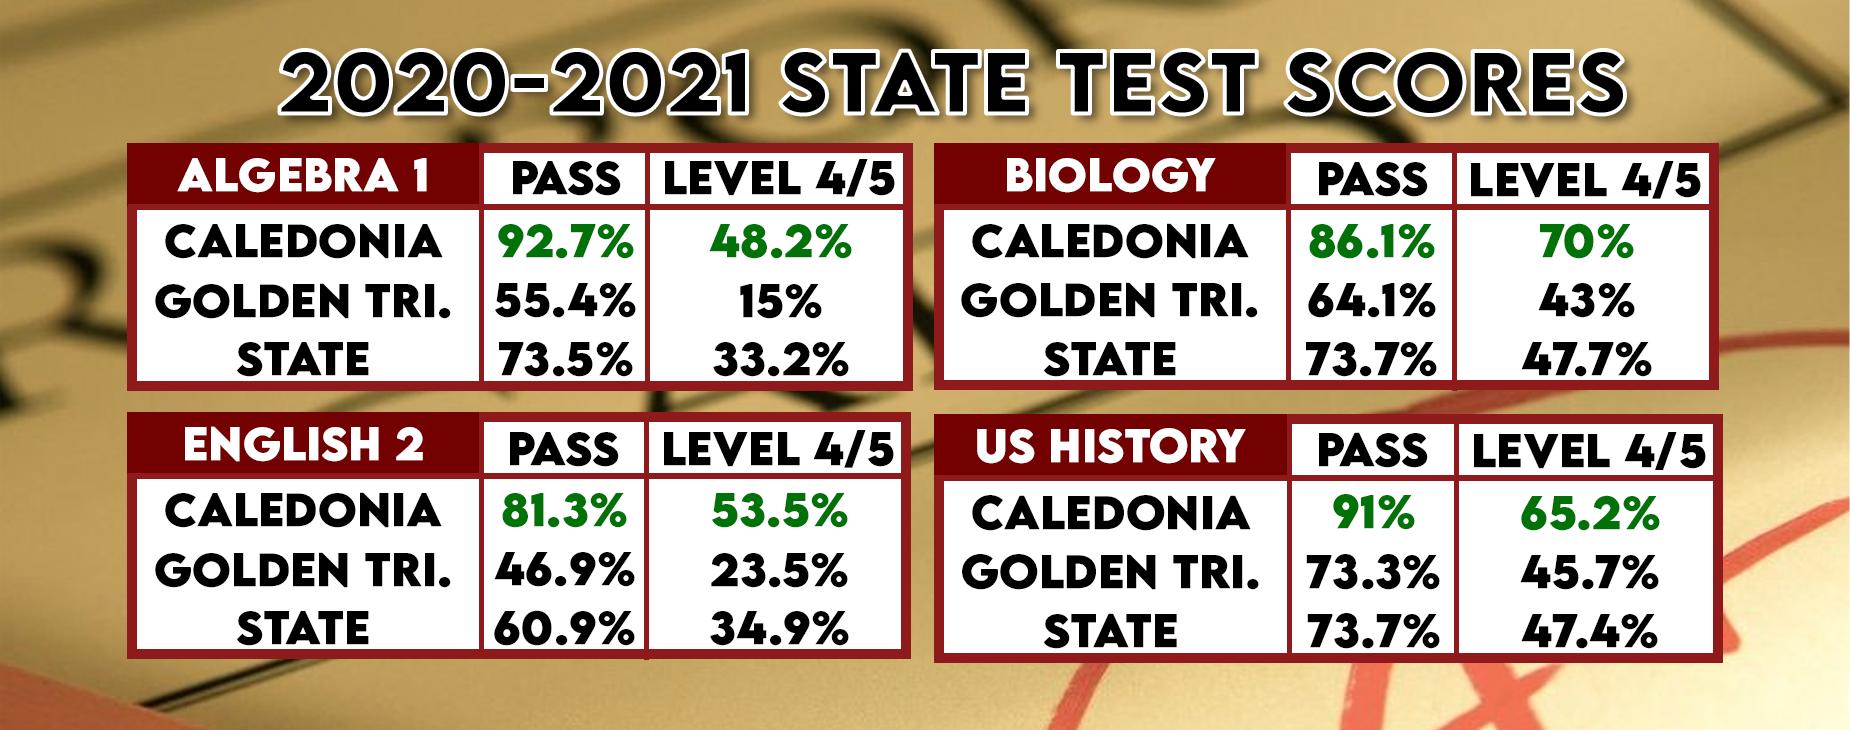 Test Scores